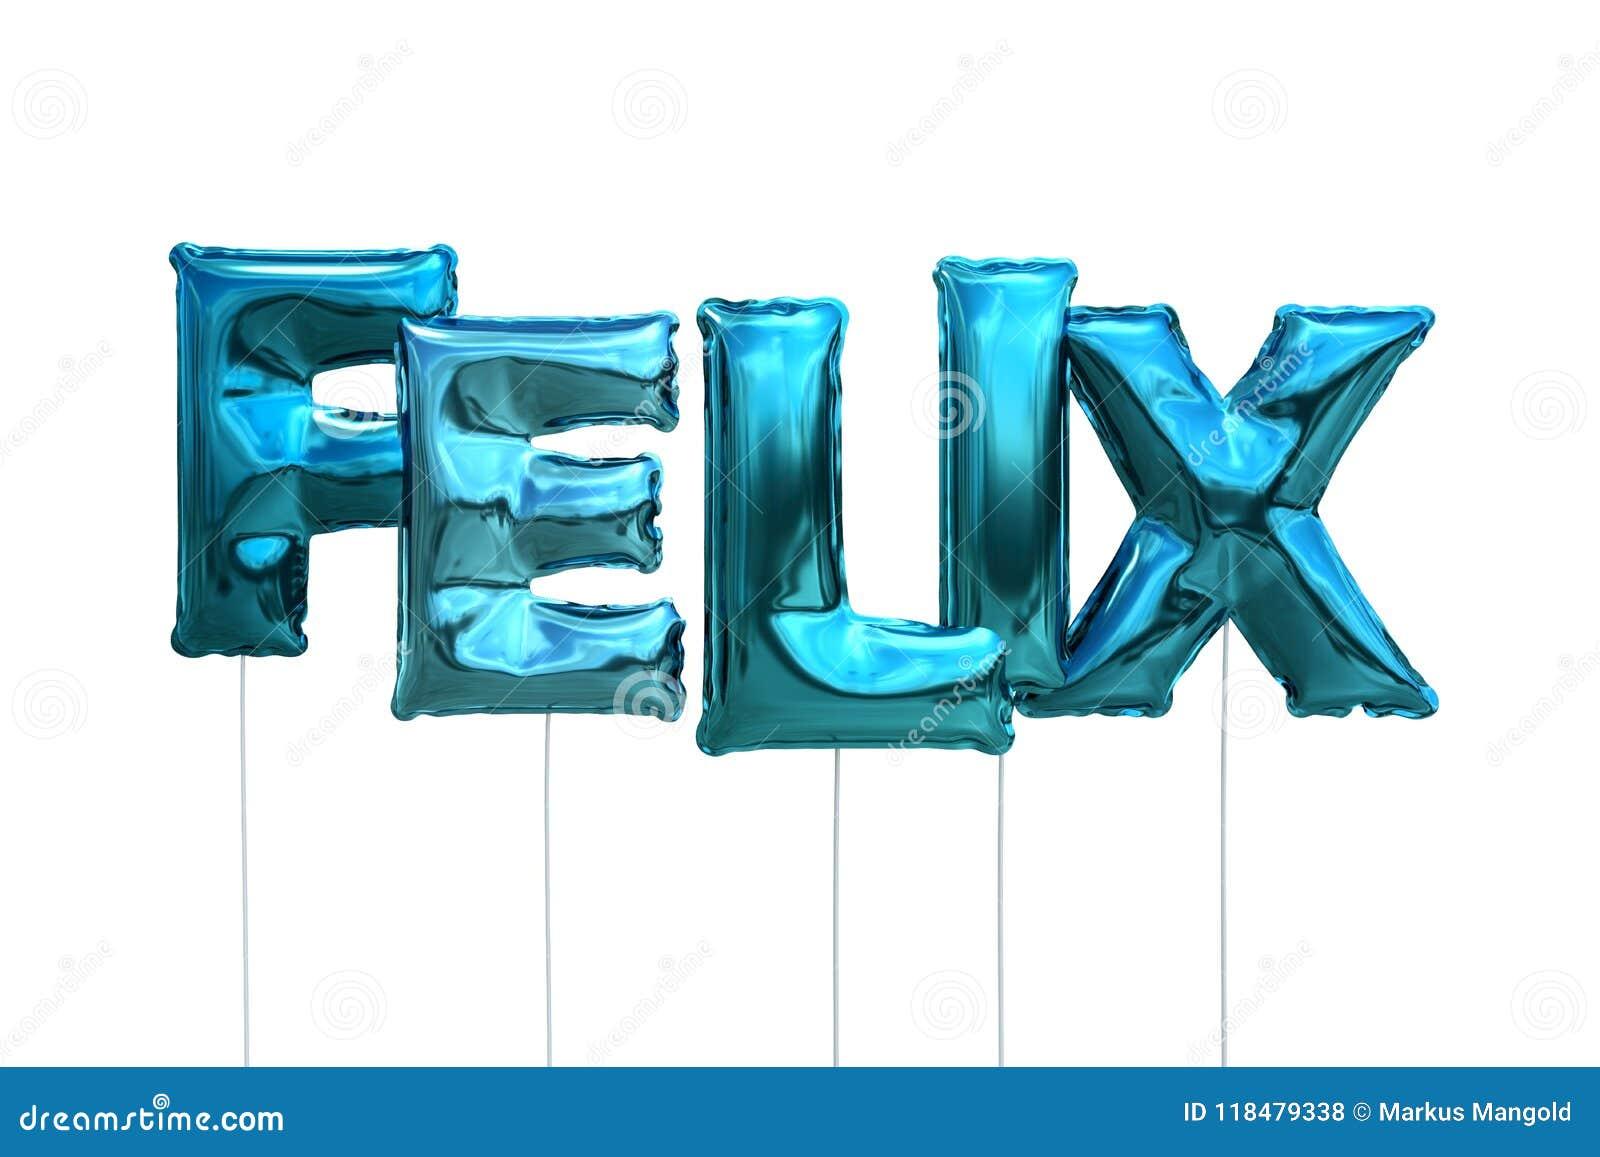 felix name